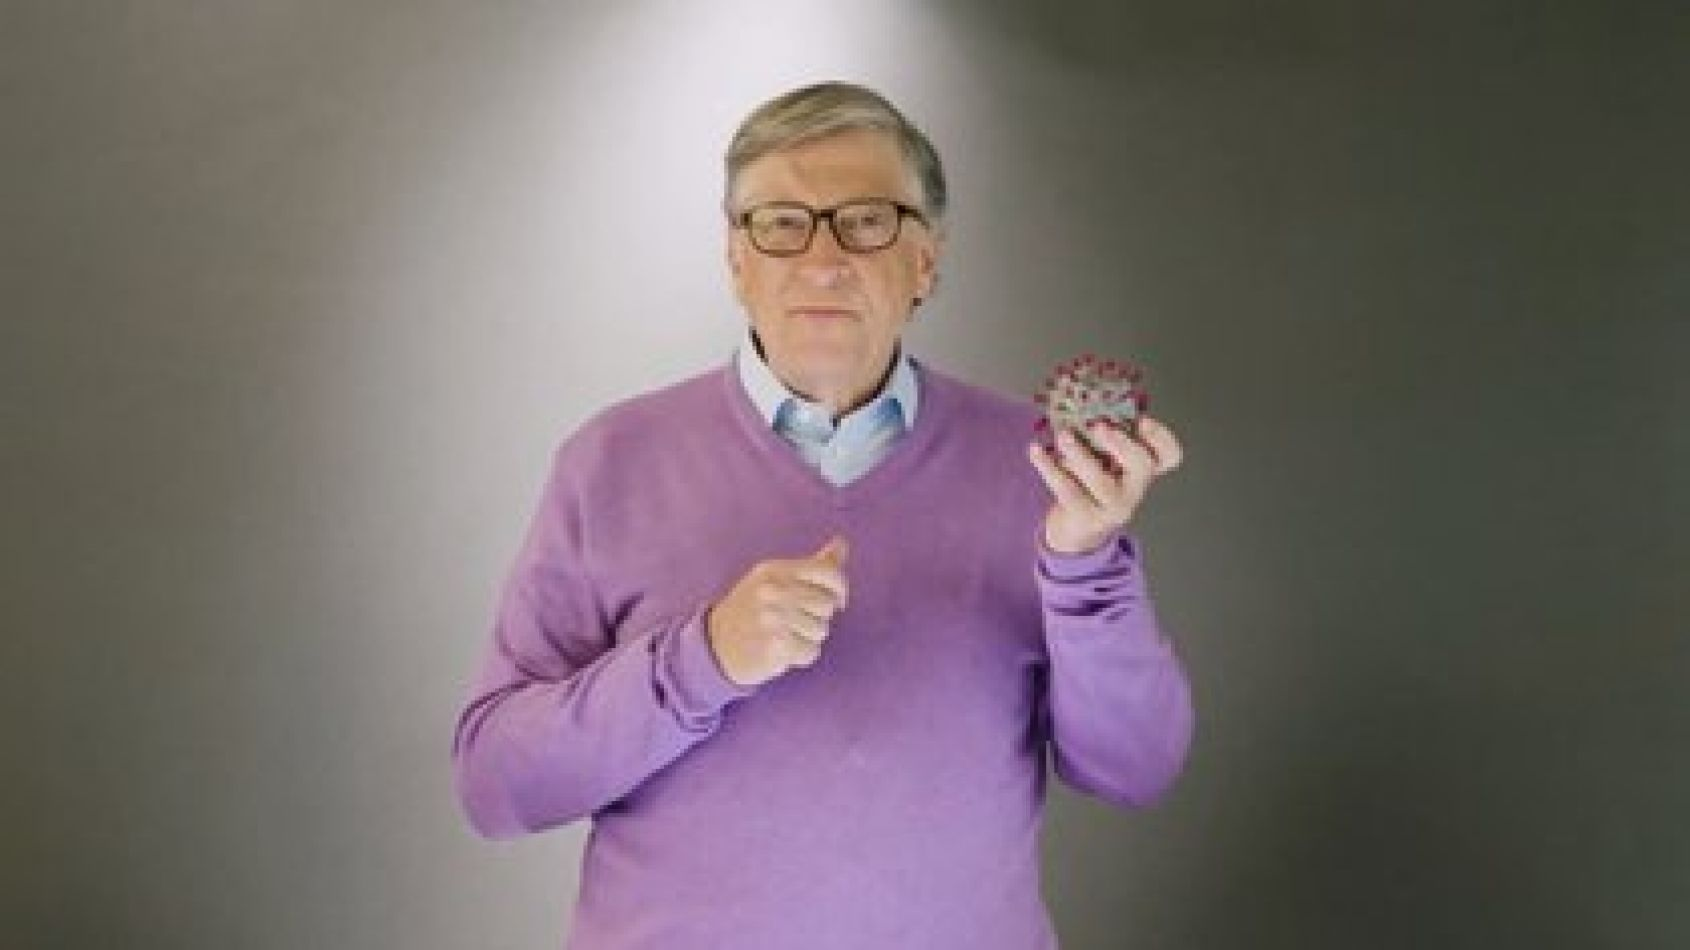 Bill Gates pronosticó cuál será la primera vacuna contra el COVID-19